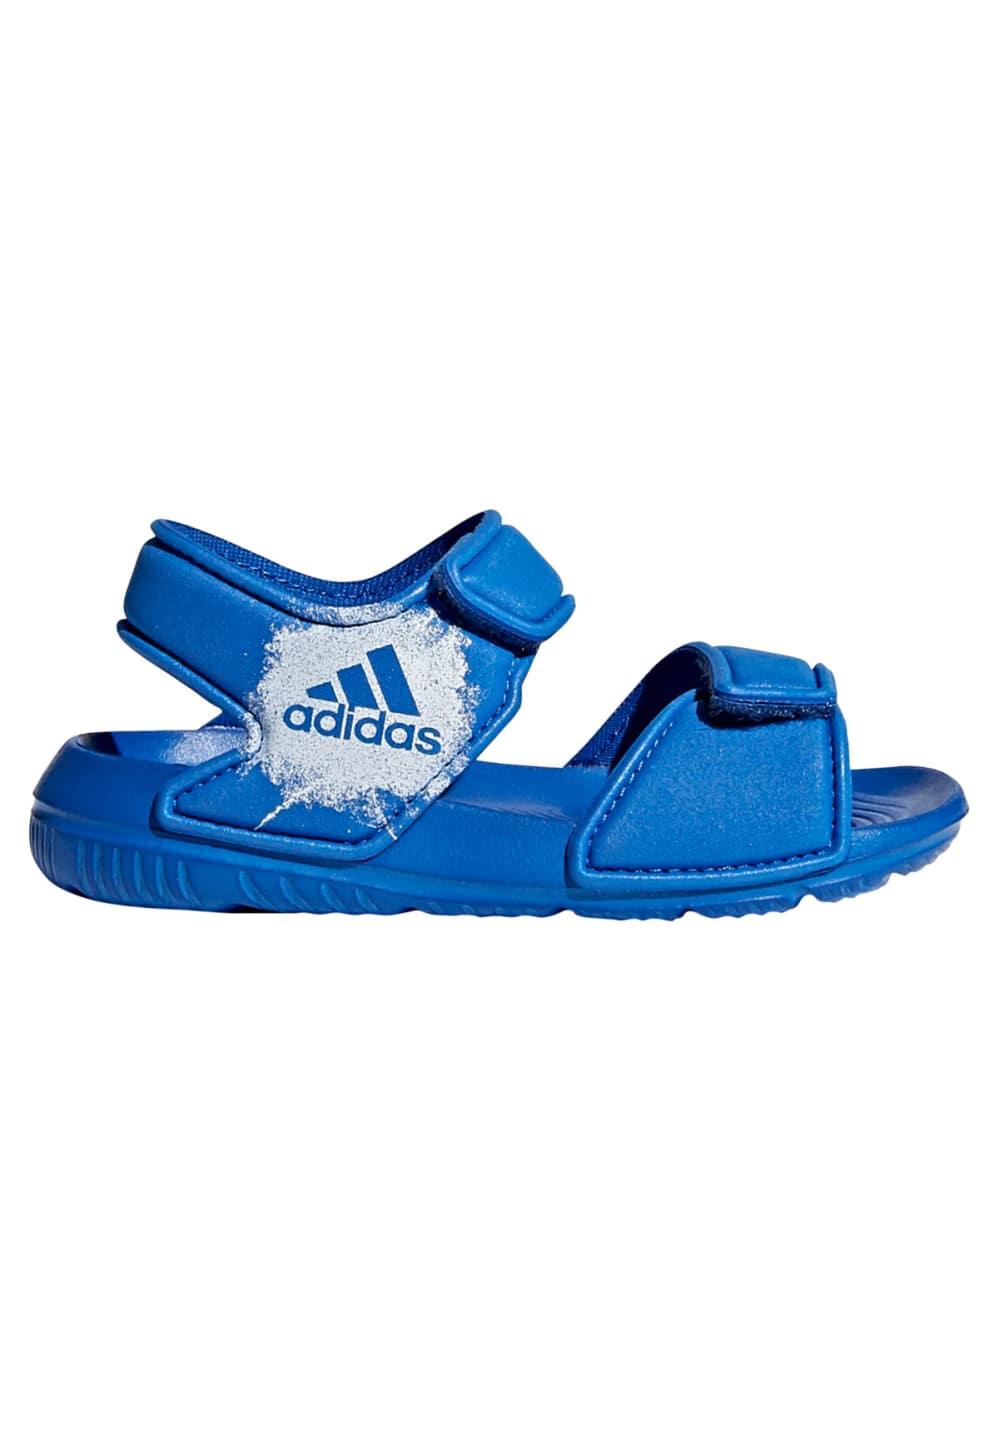 adidas AltaSwim - Badeschuhe für Kinder Unisex - Blau, Gr. 25